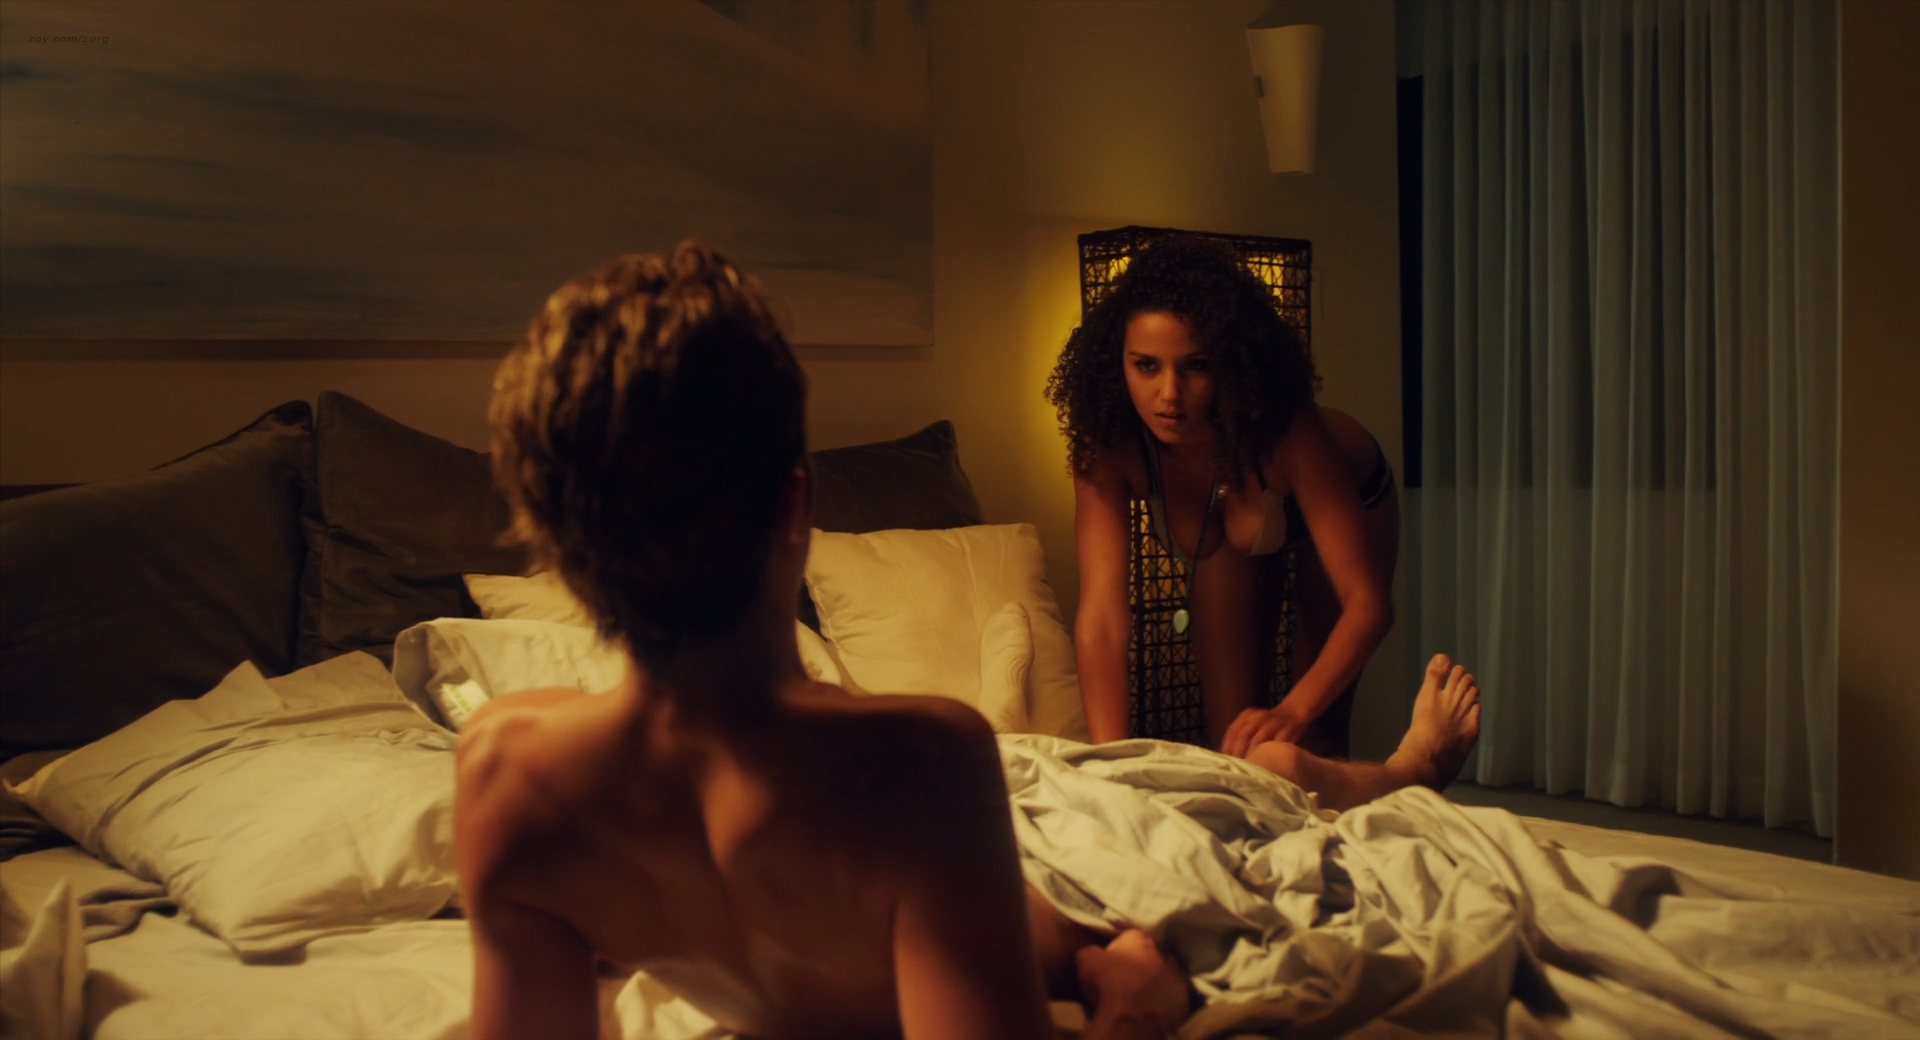 Chloe Bridges hot bikini Jillian Murray hot Mindy Robinson nude - Mantervention (2014) hd720-1080p (1)